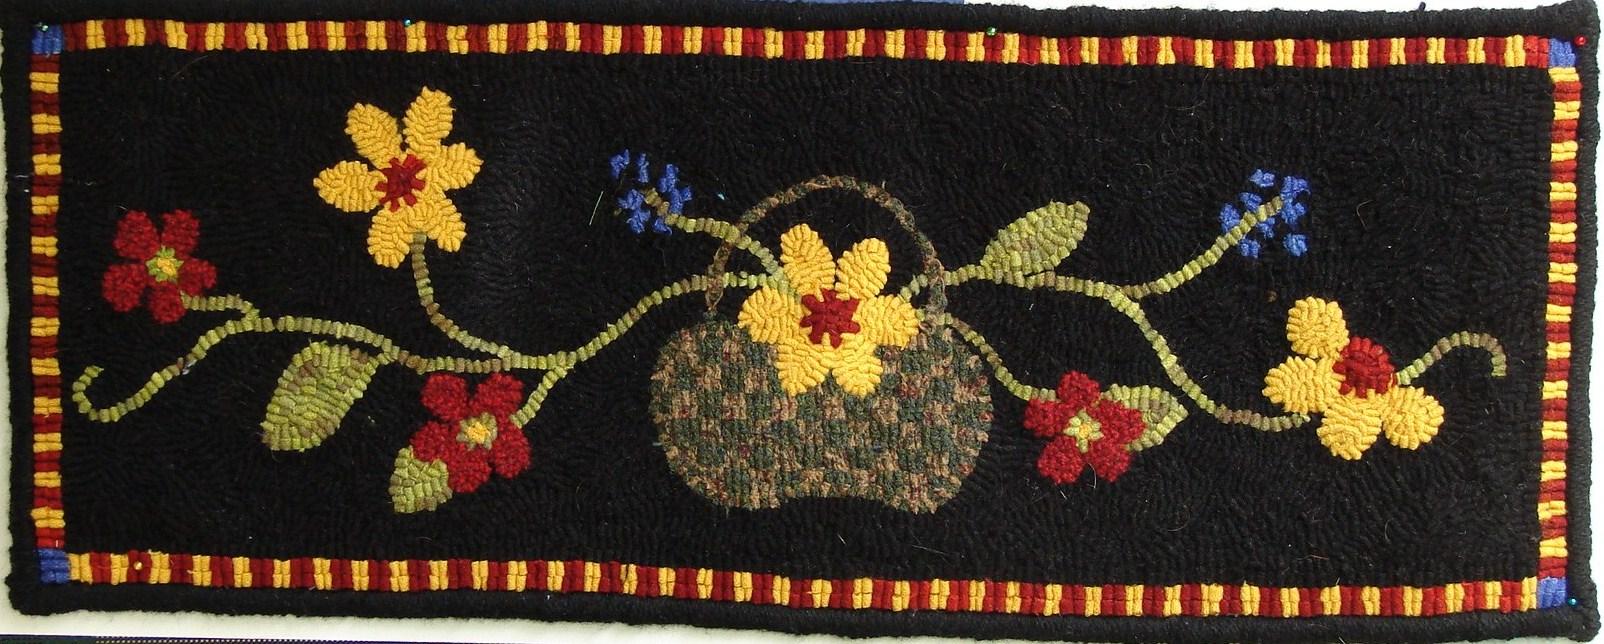 Mountain Wool Rug Hooking Kits By Sara Beth Black